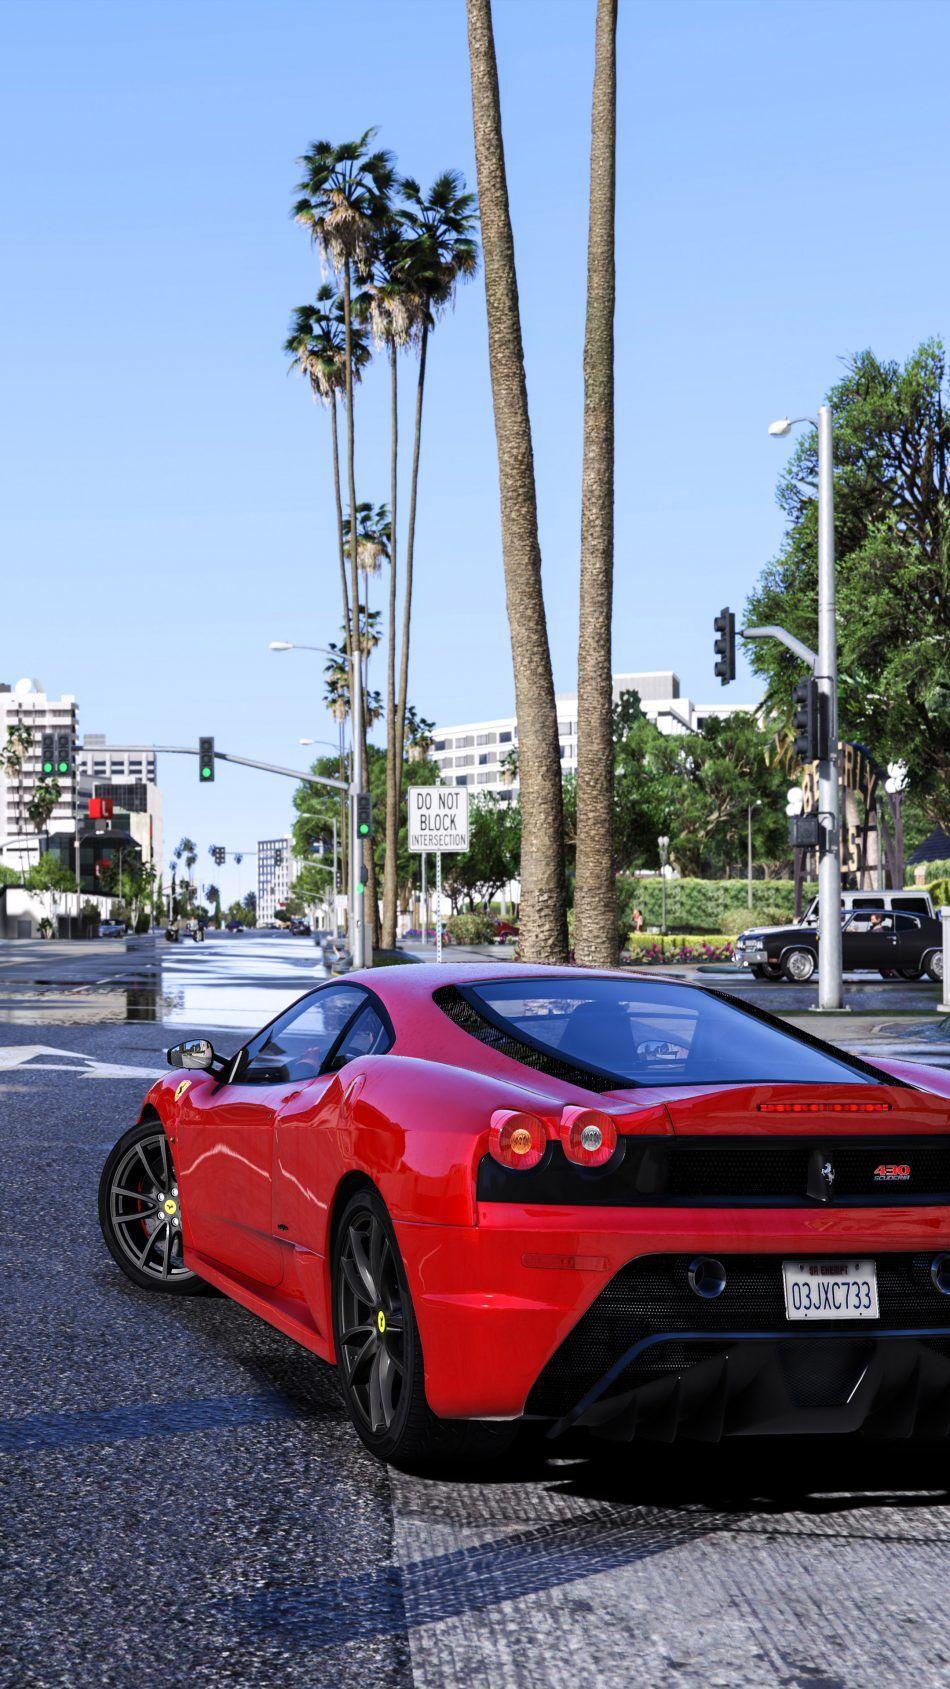 Gta V Red Ferrari 4k Ultra Hd Mobile Wallpaper Gta Ferrari Gta Pc